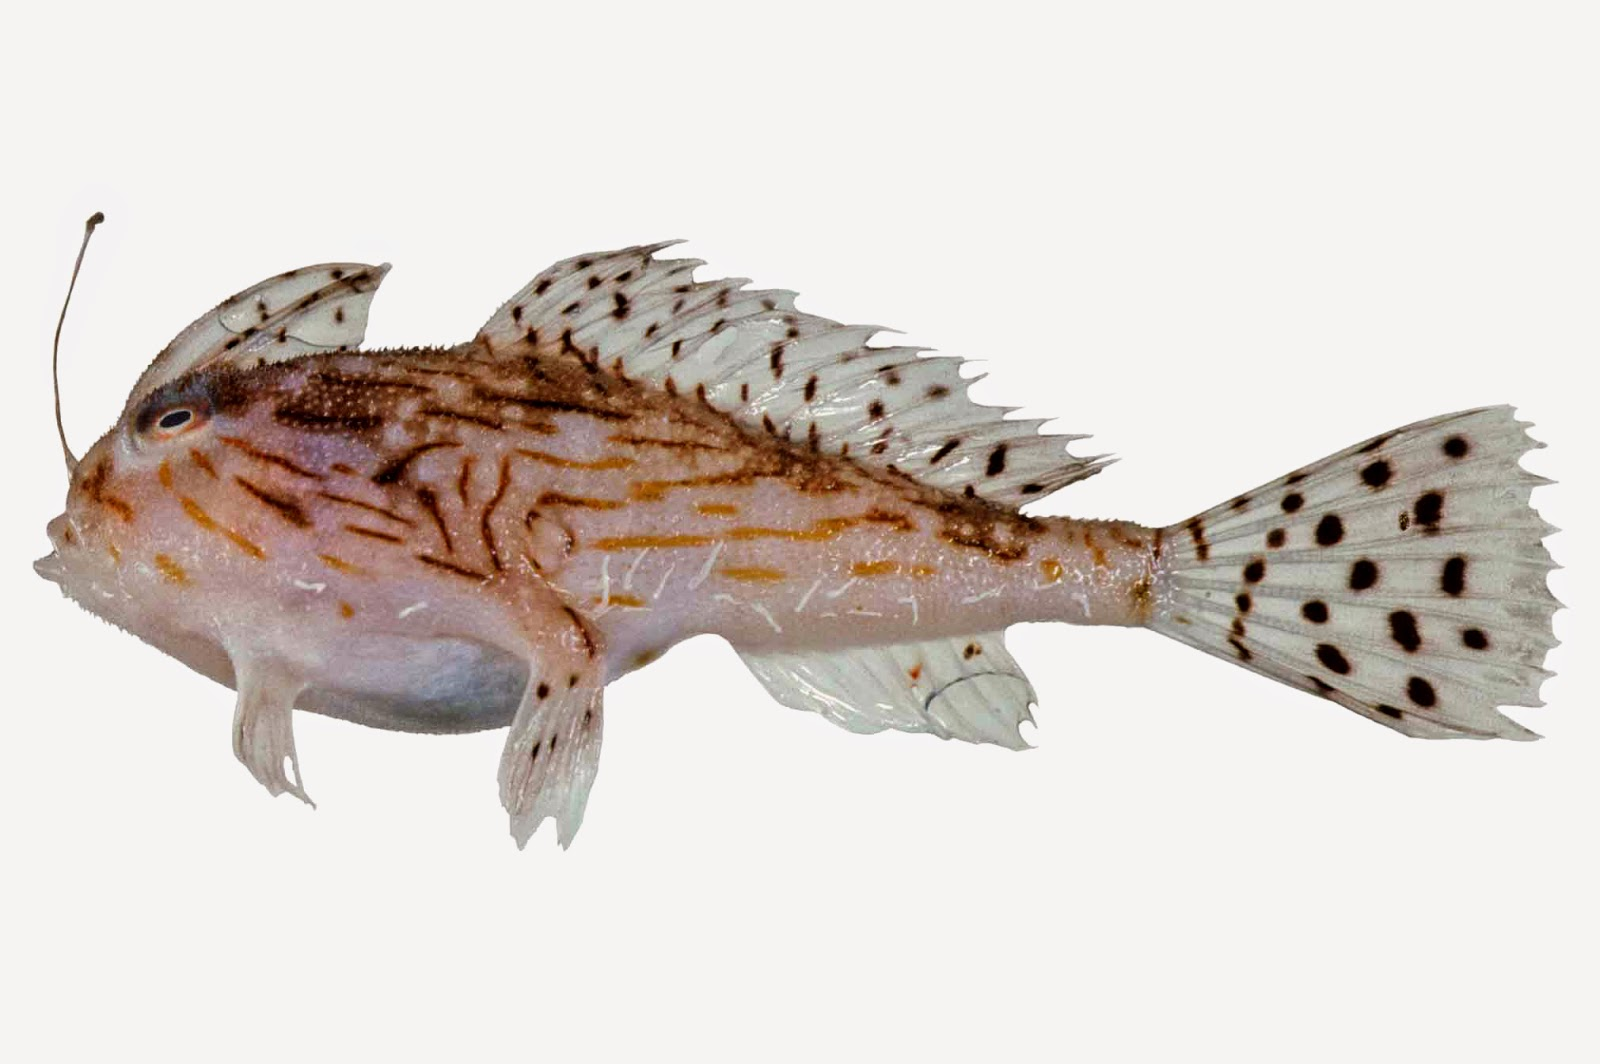 http://fishshare.blogspot.com/2015/01/handfish-pictures-2.html